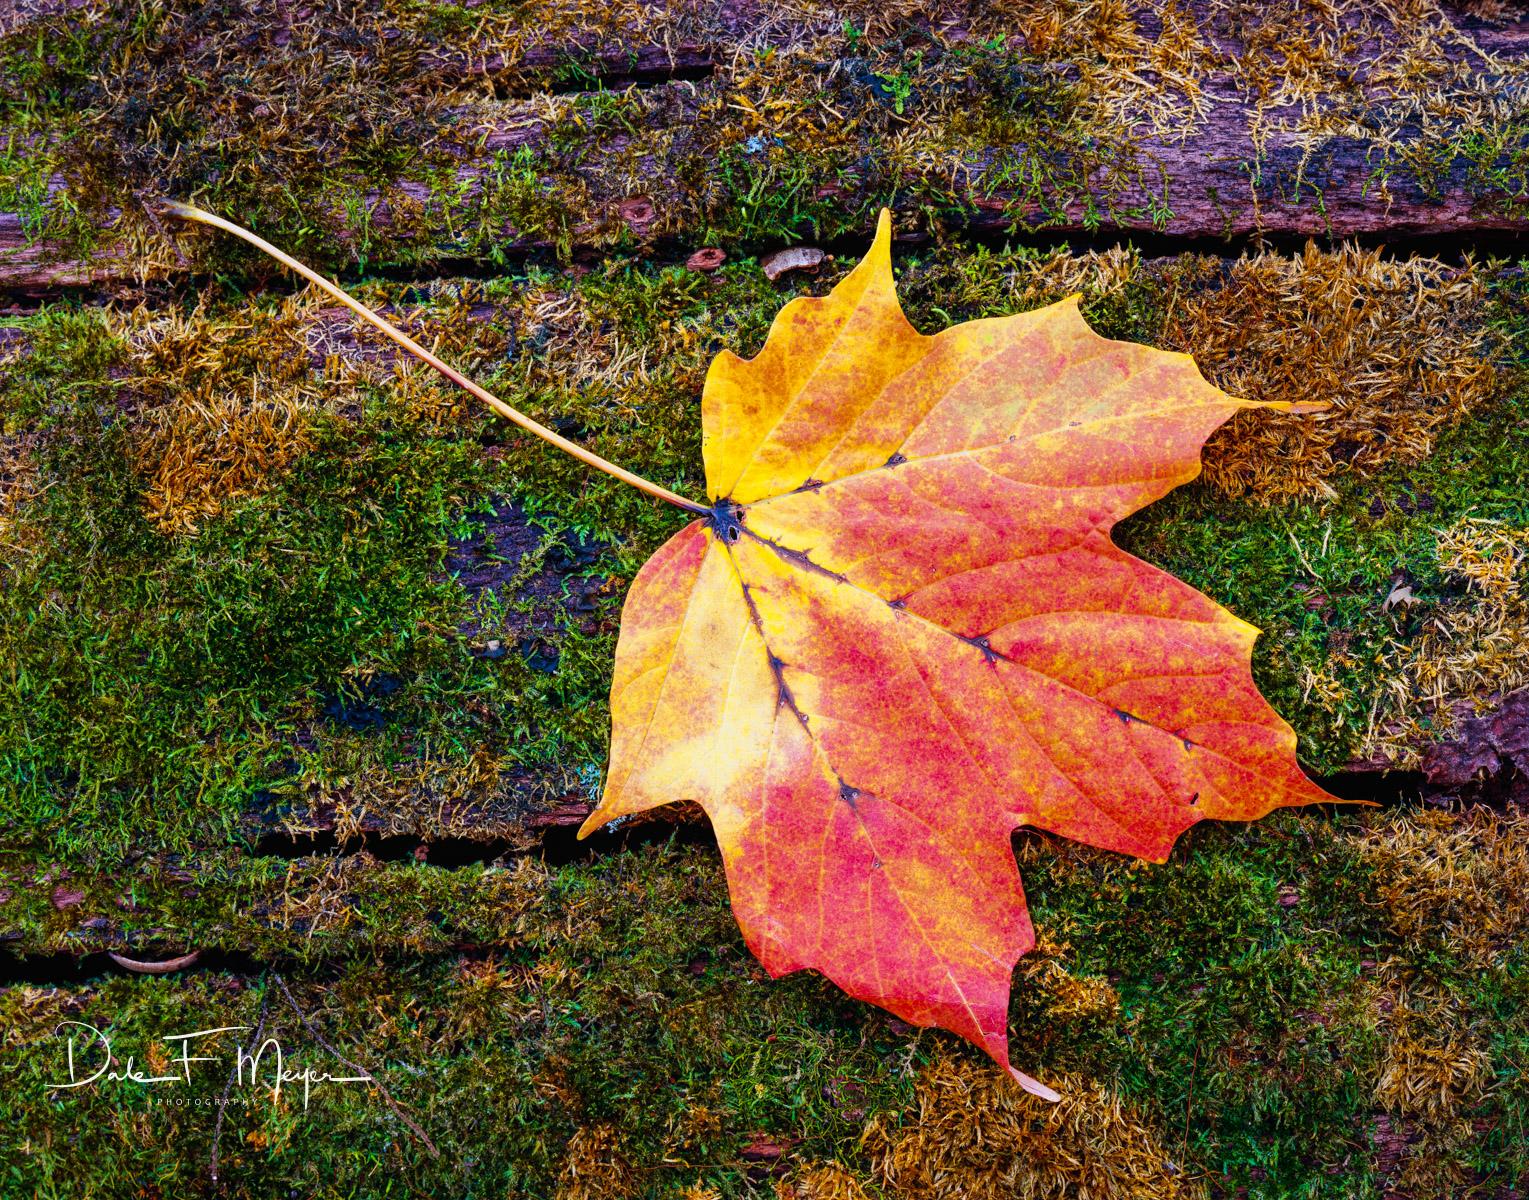 4X5 Fuji 50 Slide Film,fall,maple leaf on moss log, photo